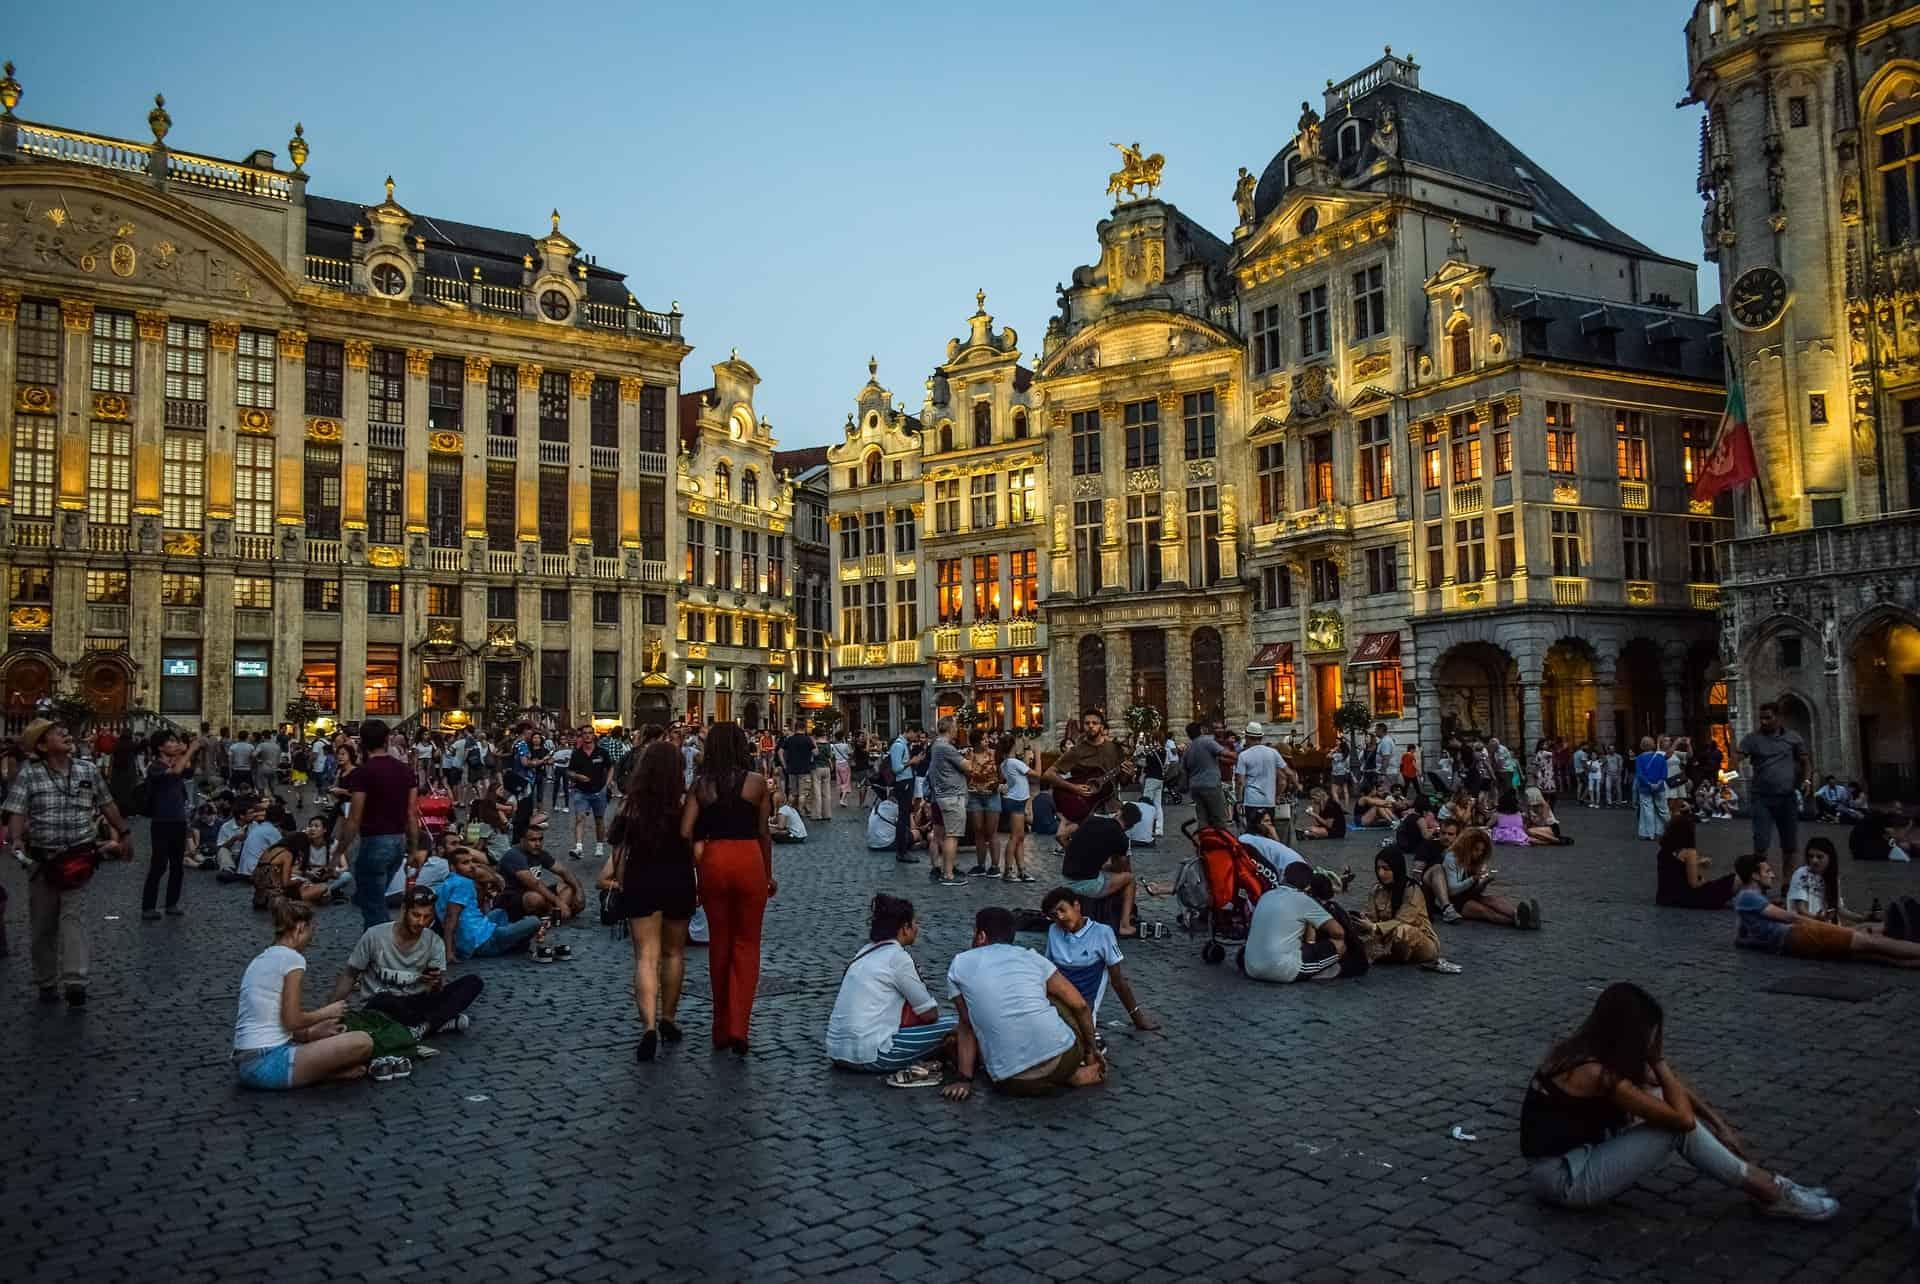 Gay Brussels · فنادق متوسطة المدى + اقتصادية